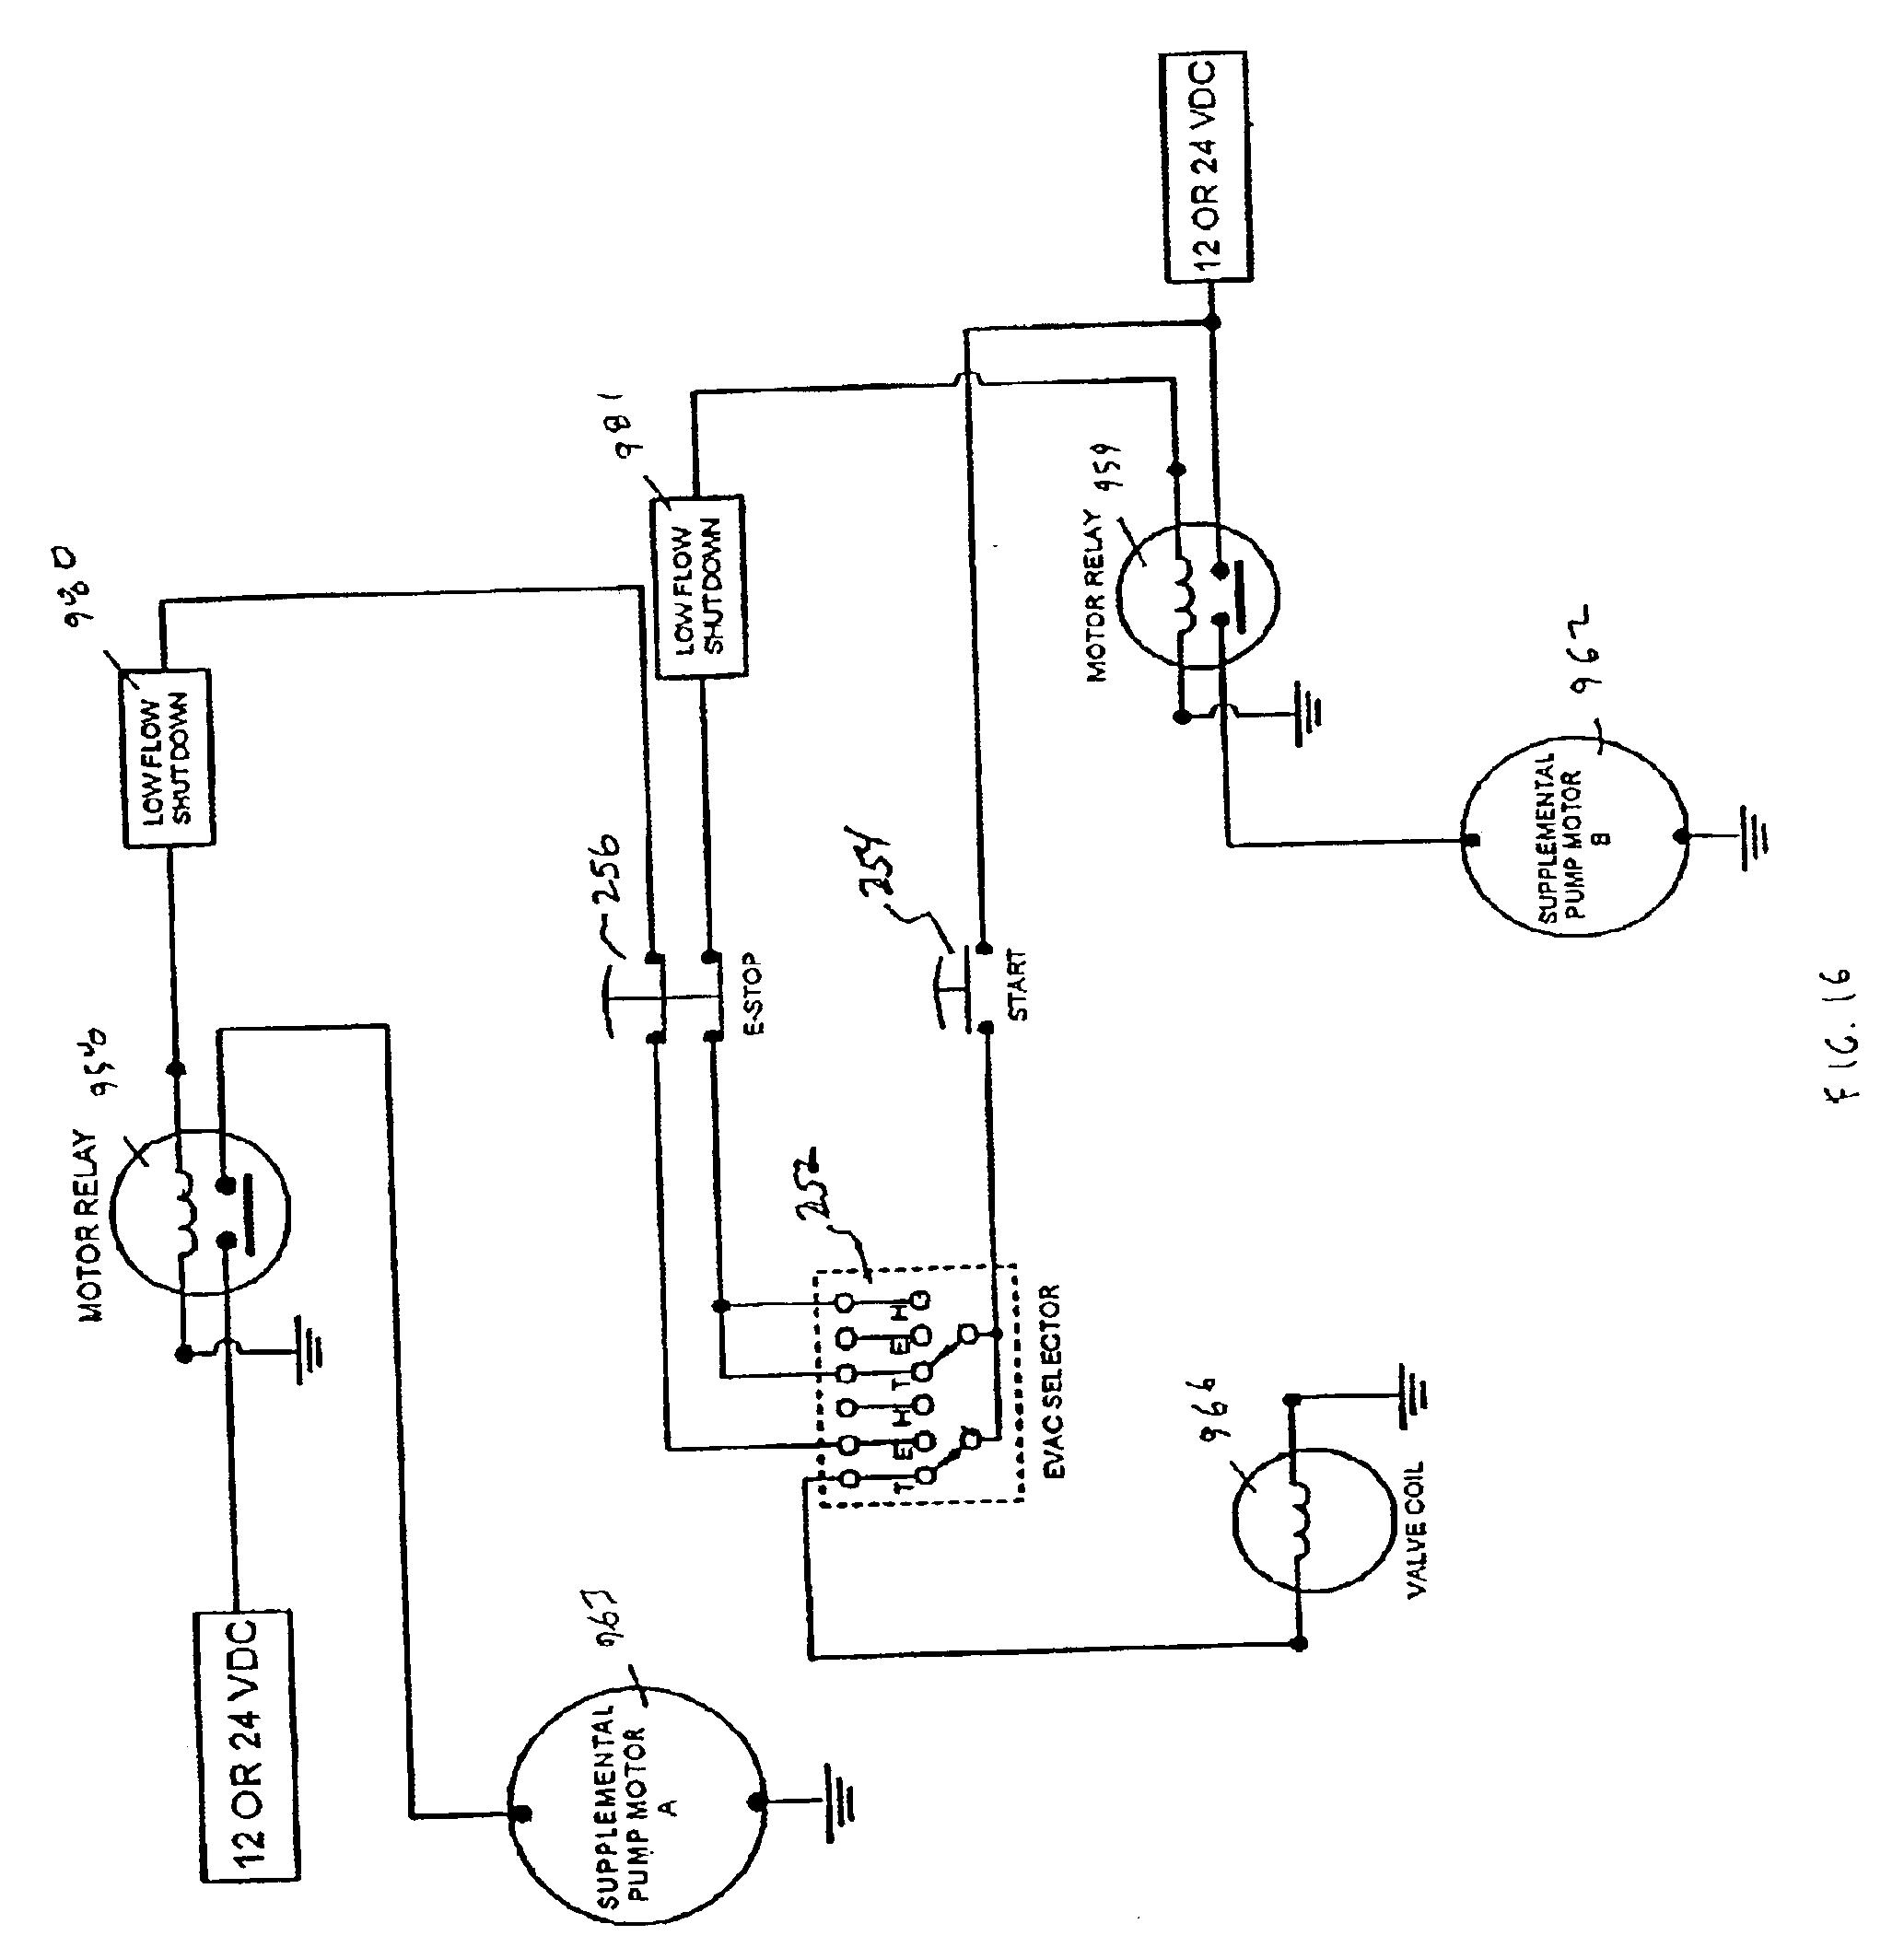 wiring diagram for mercury outboard readingrat